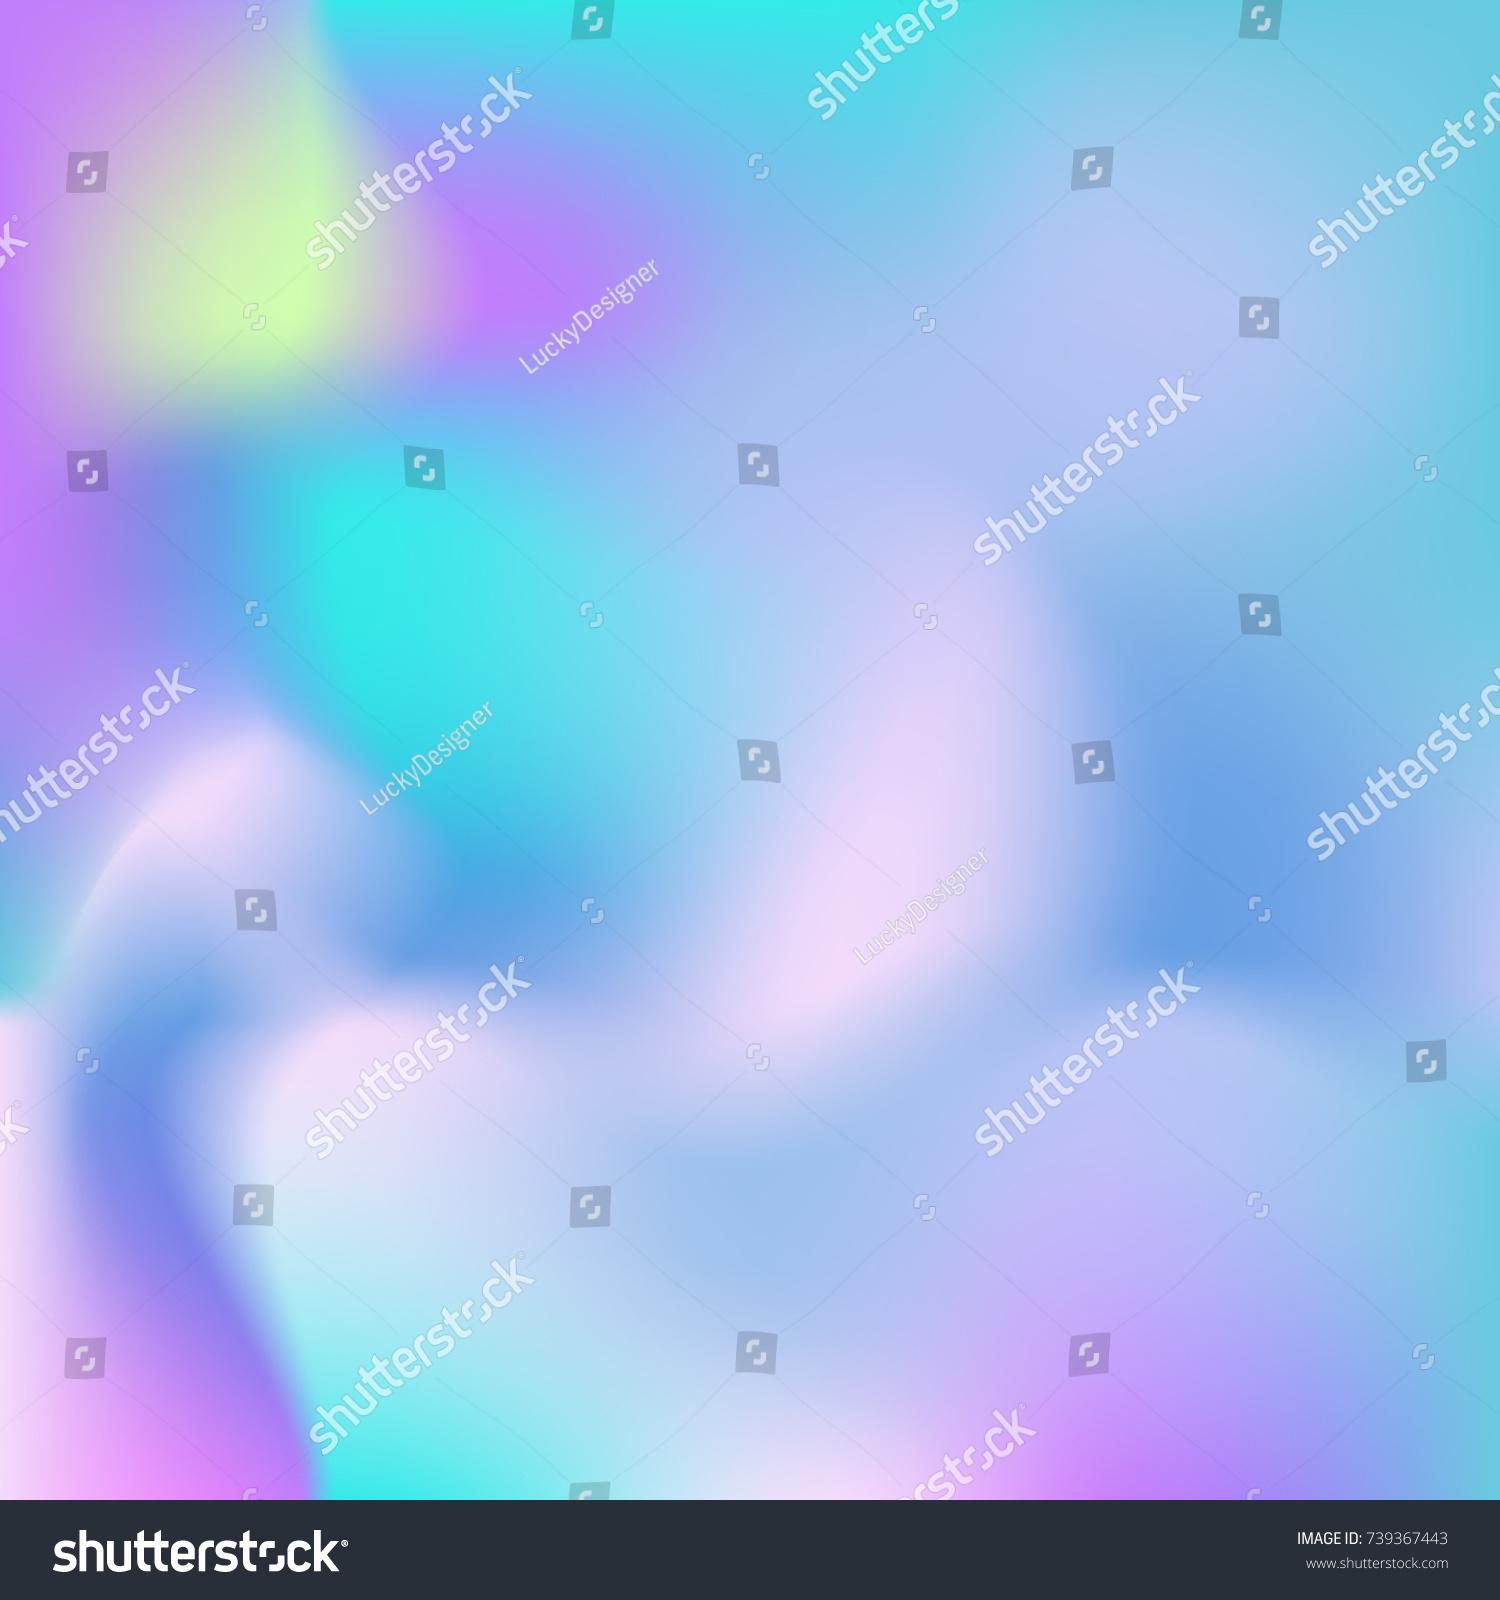 Soft Color Gradient Background Holographic Wallpaper 739367443